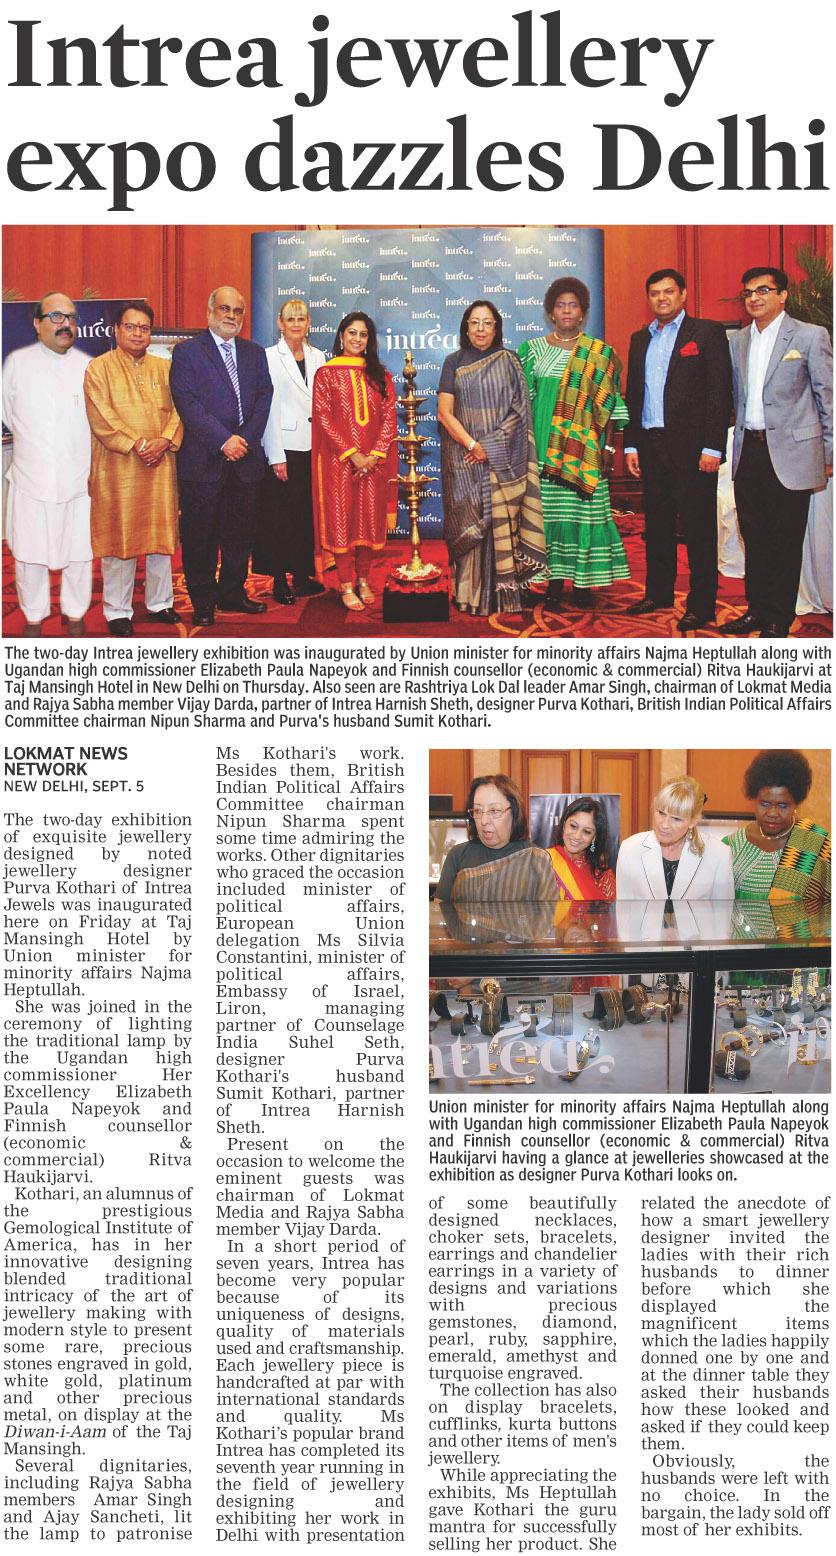 Intrea jewellery expo dazzles Delhi